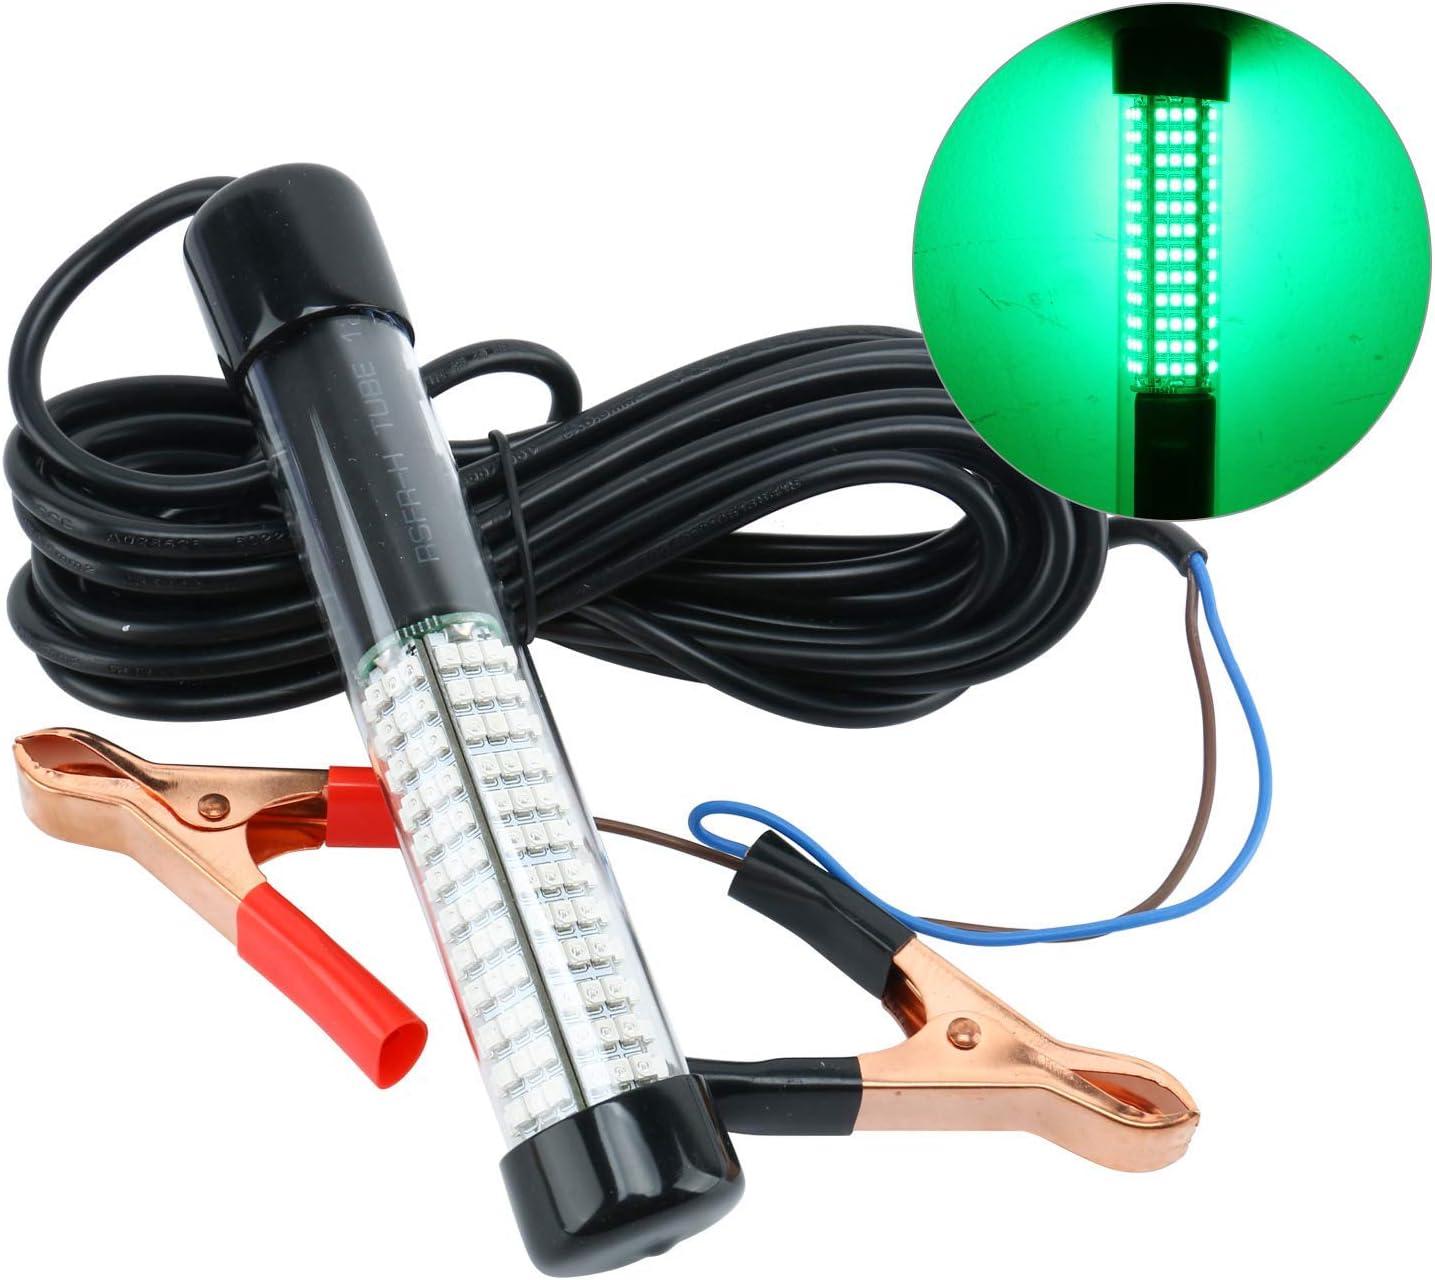 Bargain sale Amarine Made 12v 180 LED 10.8W Many popular brands Finder 900 Lumens Bait Night Lure